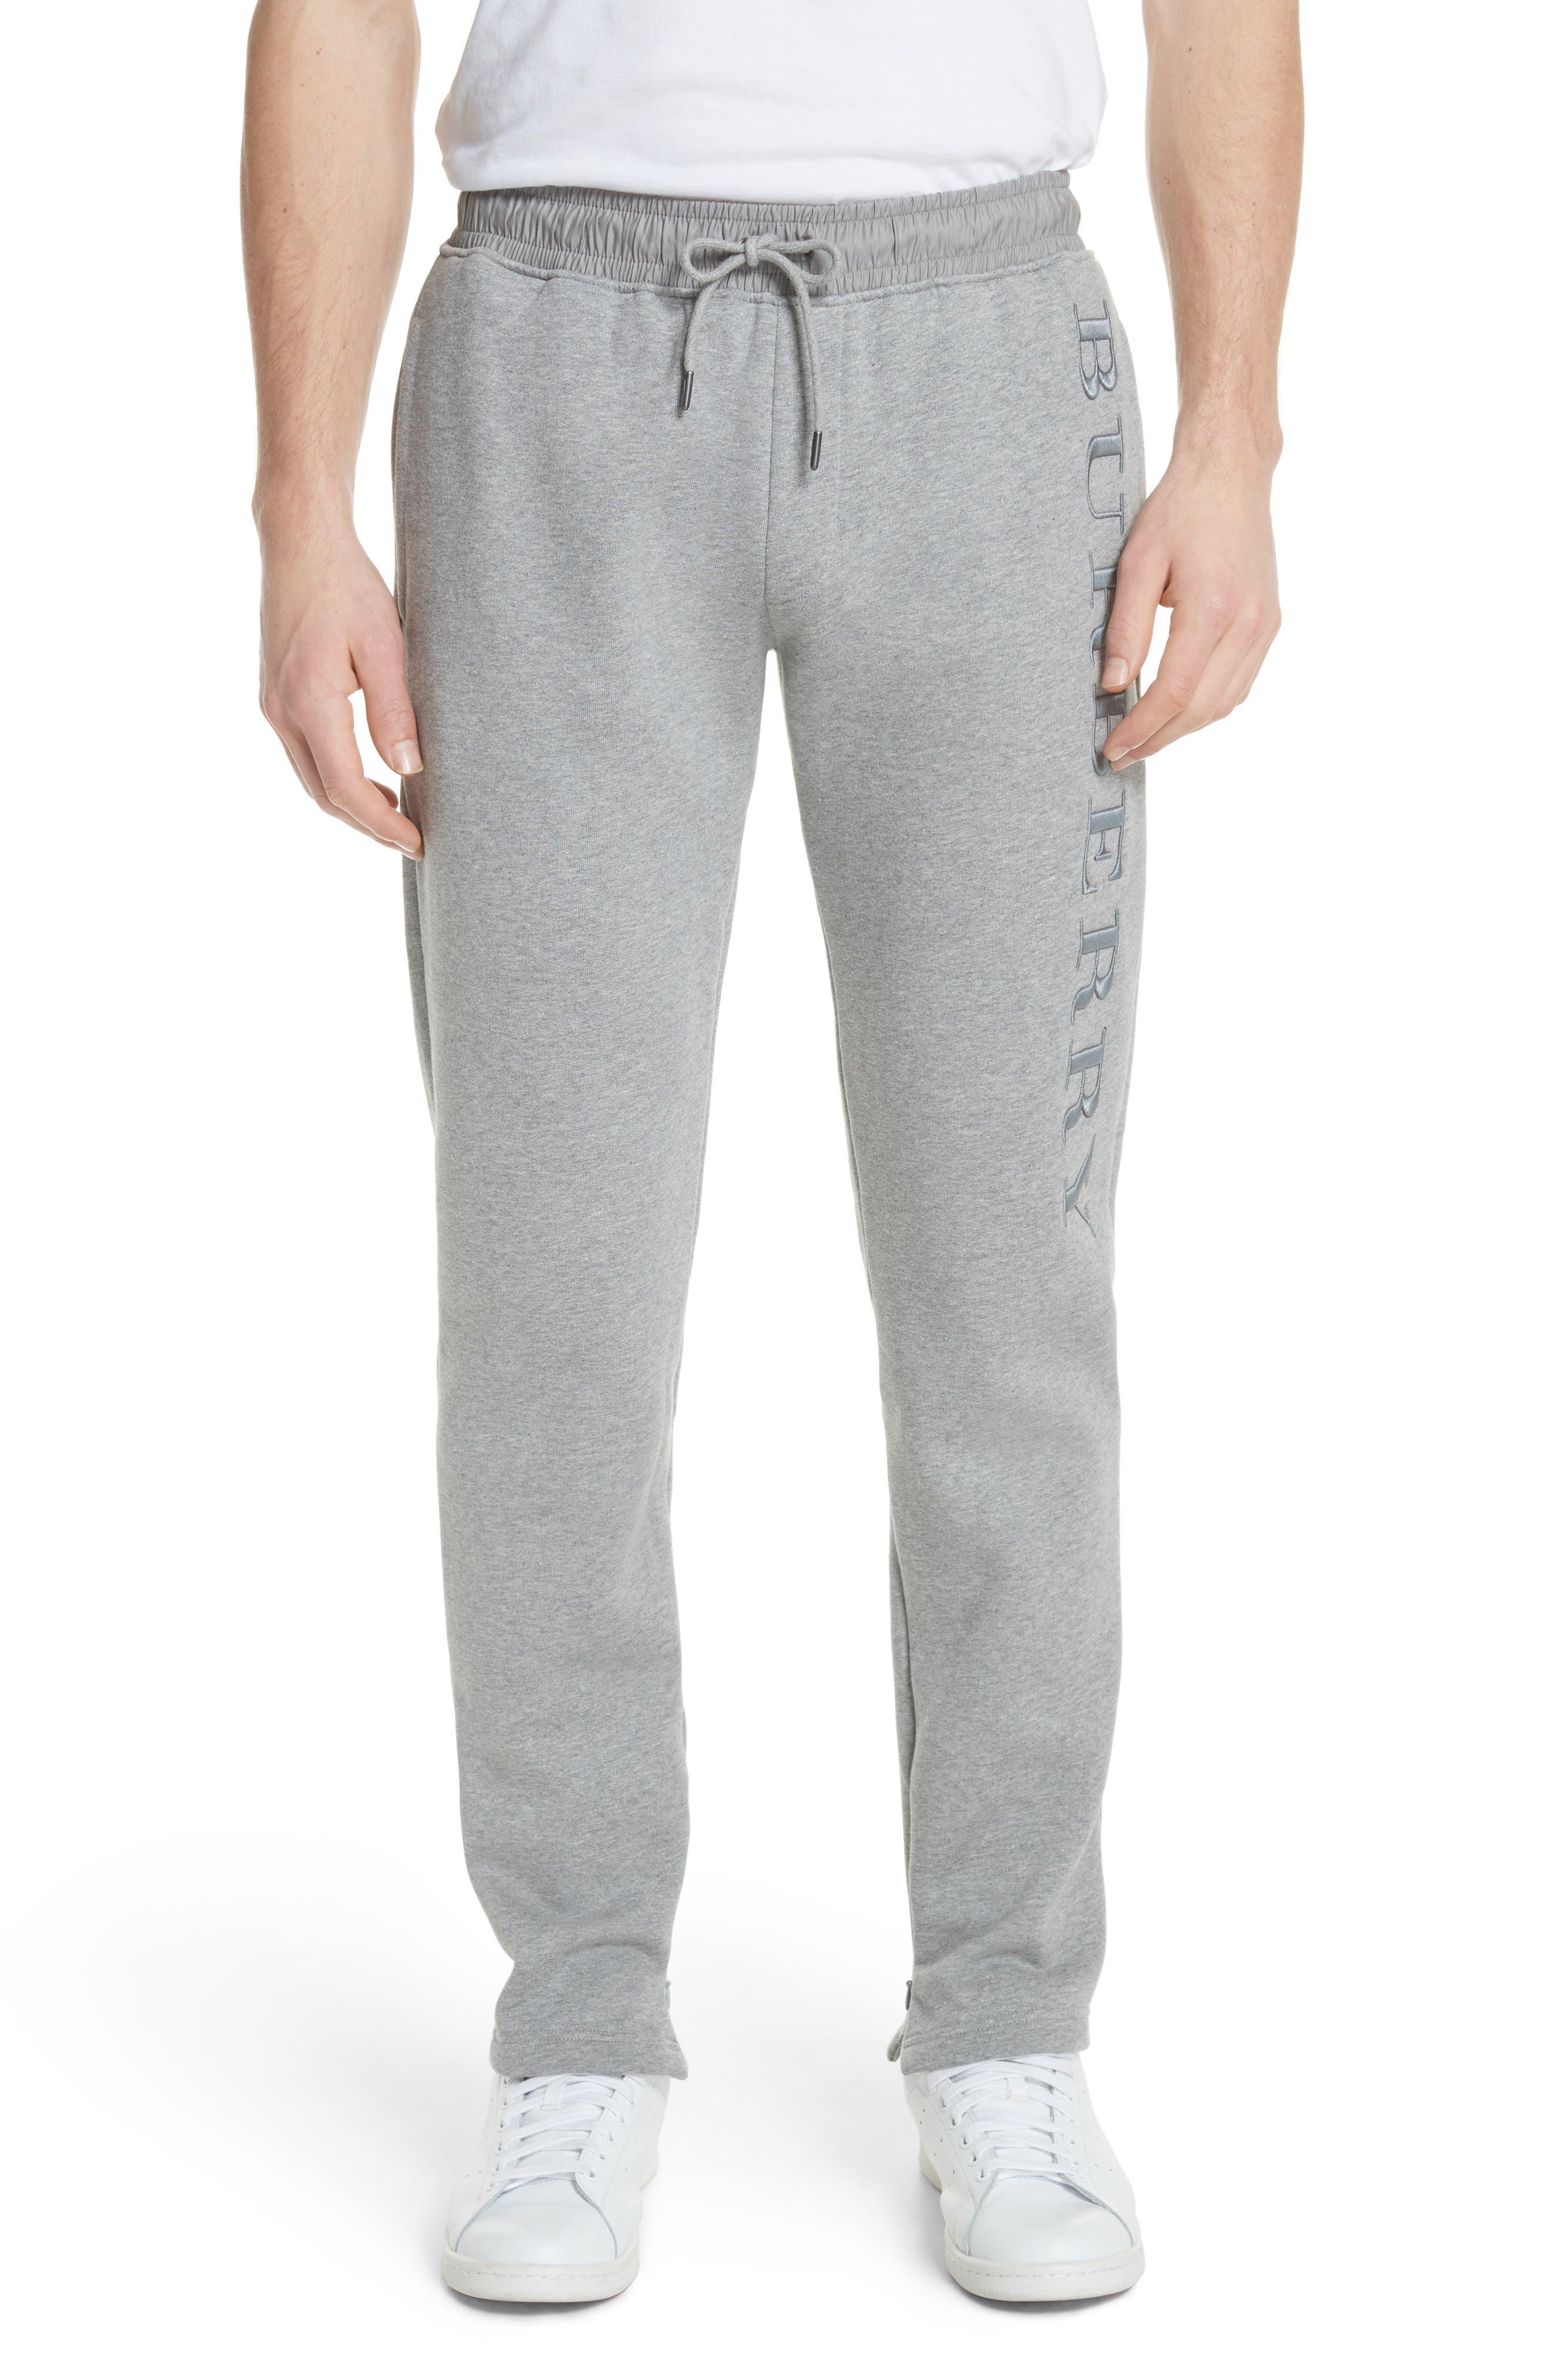 Nickford Lounge Pants,                             Main thumbnail 2, color,